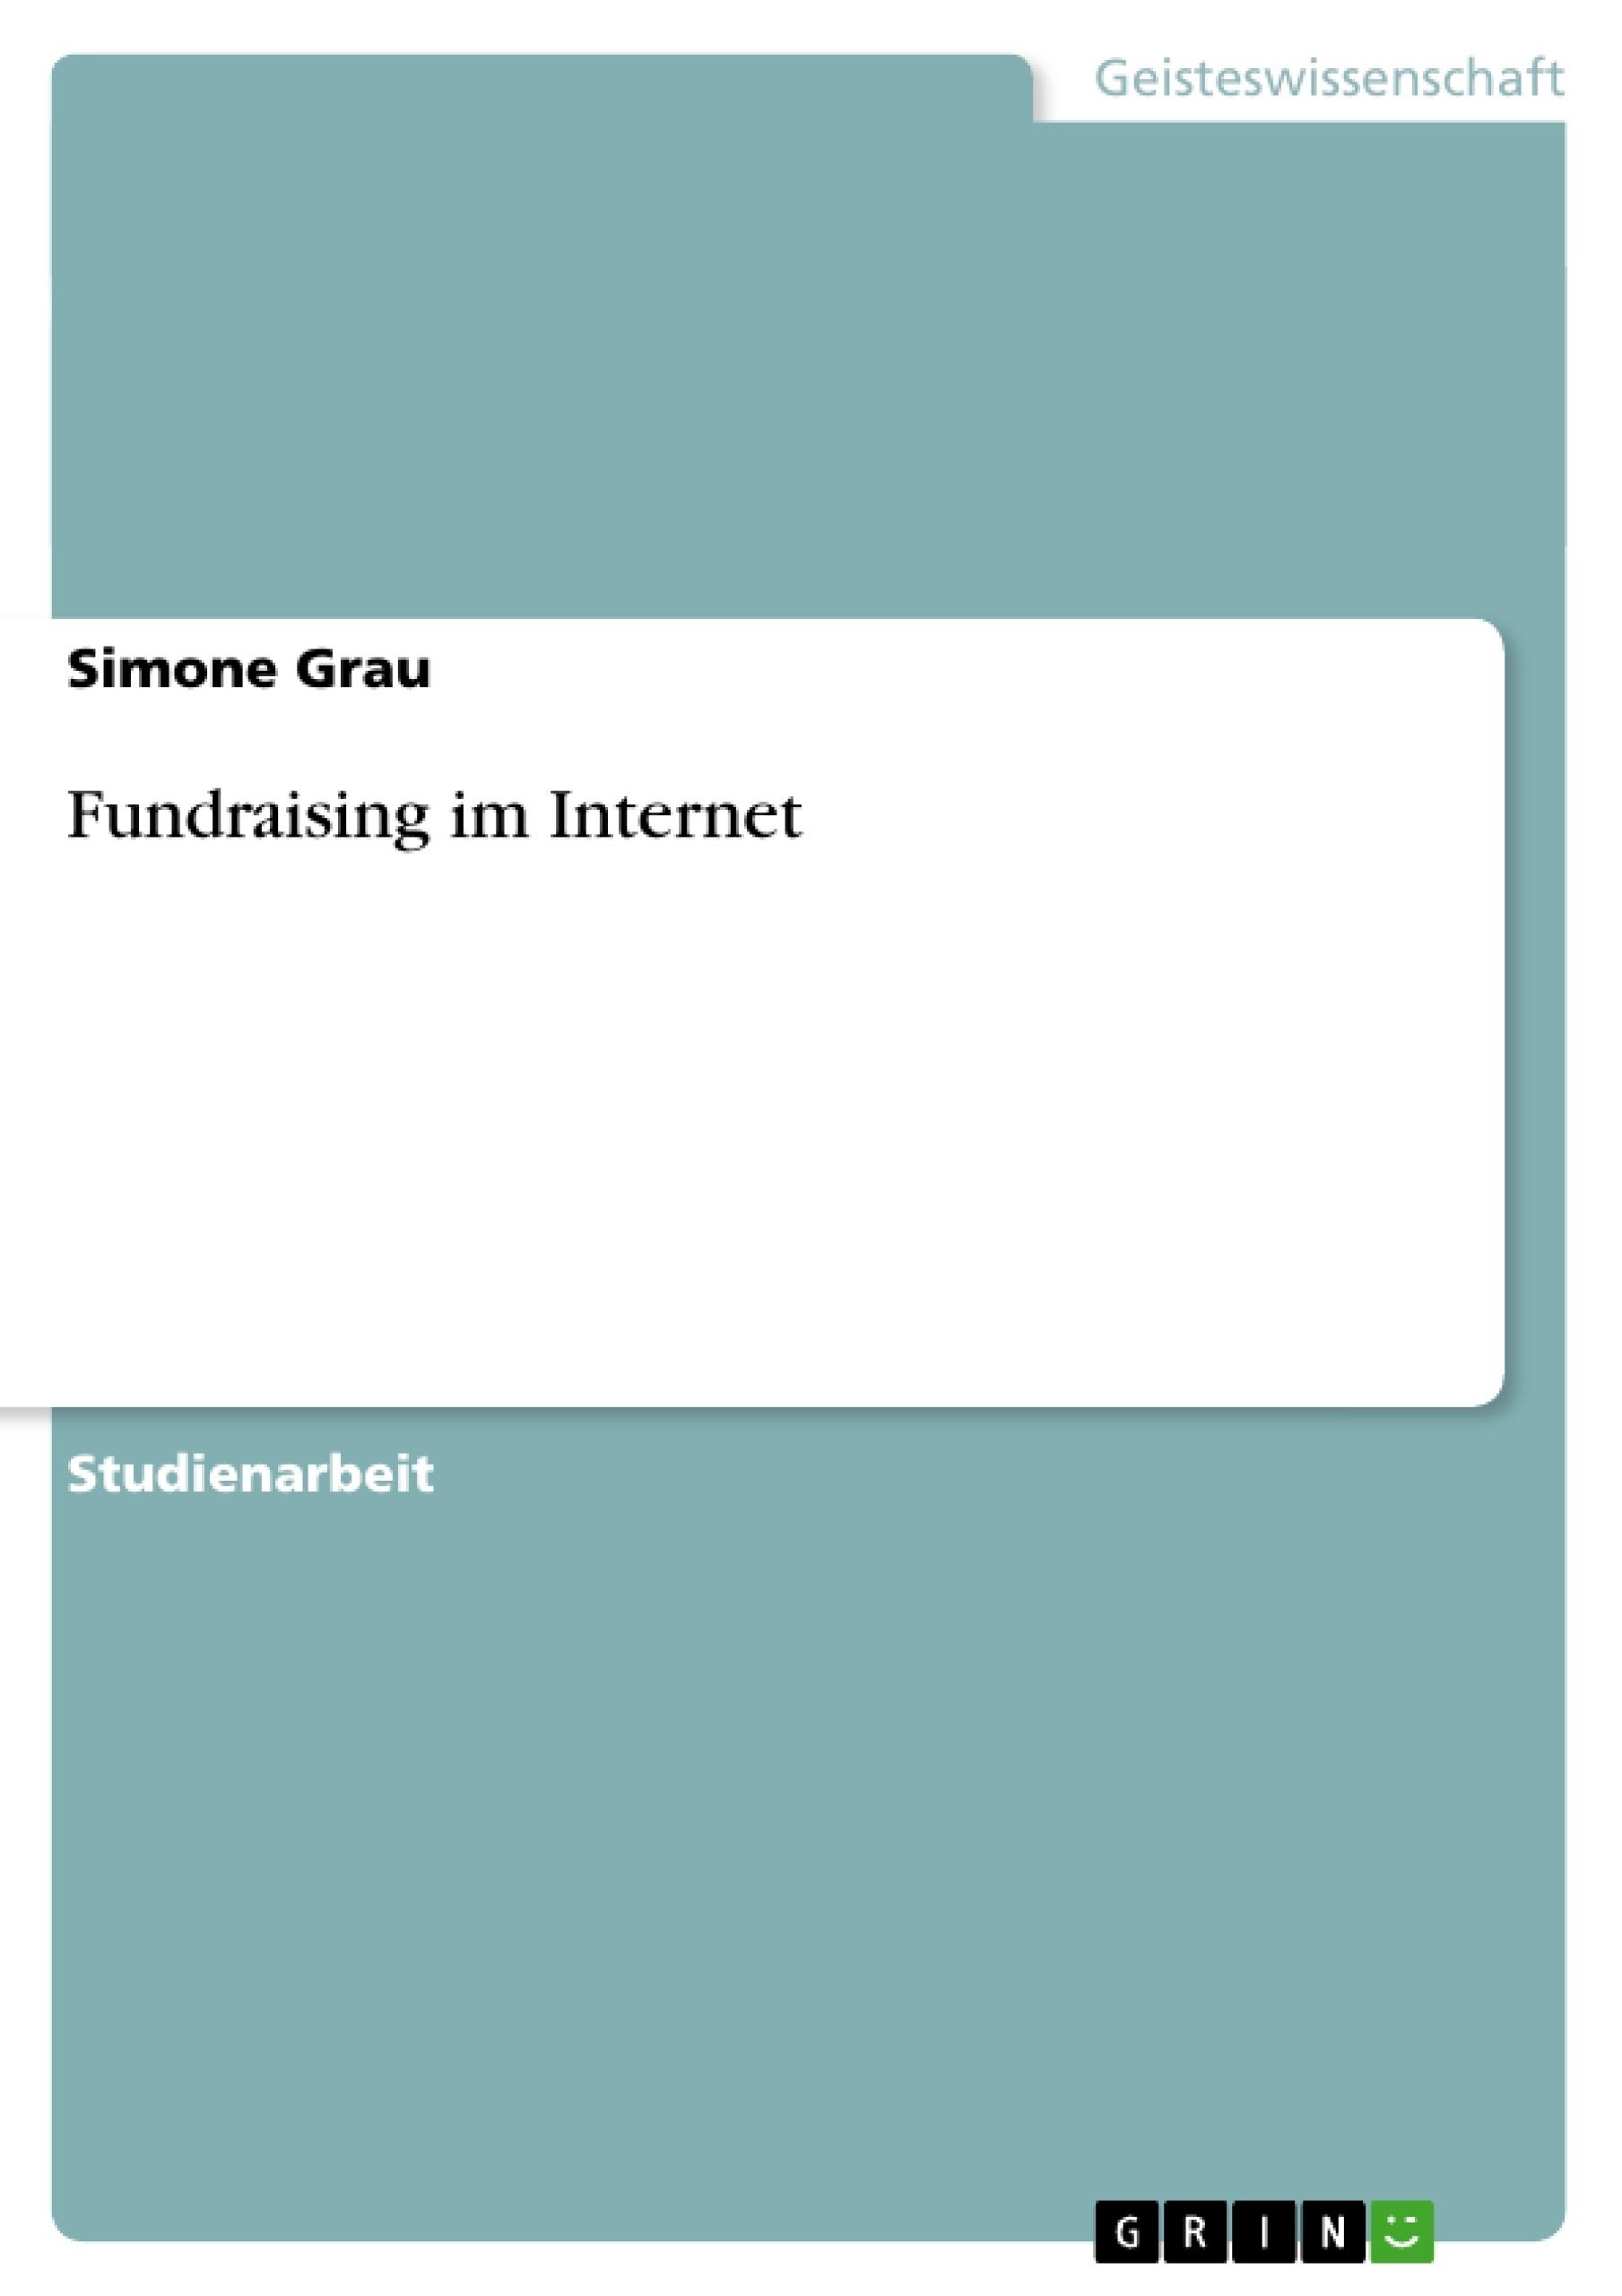 Titel: Fundraising im Internet